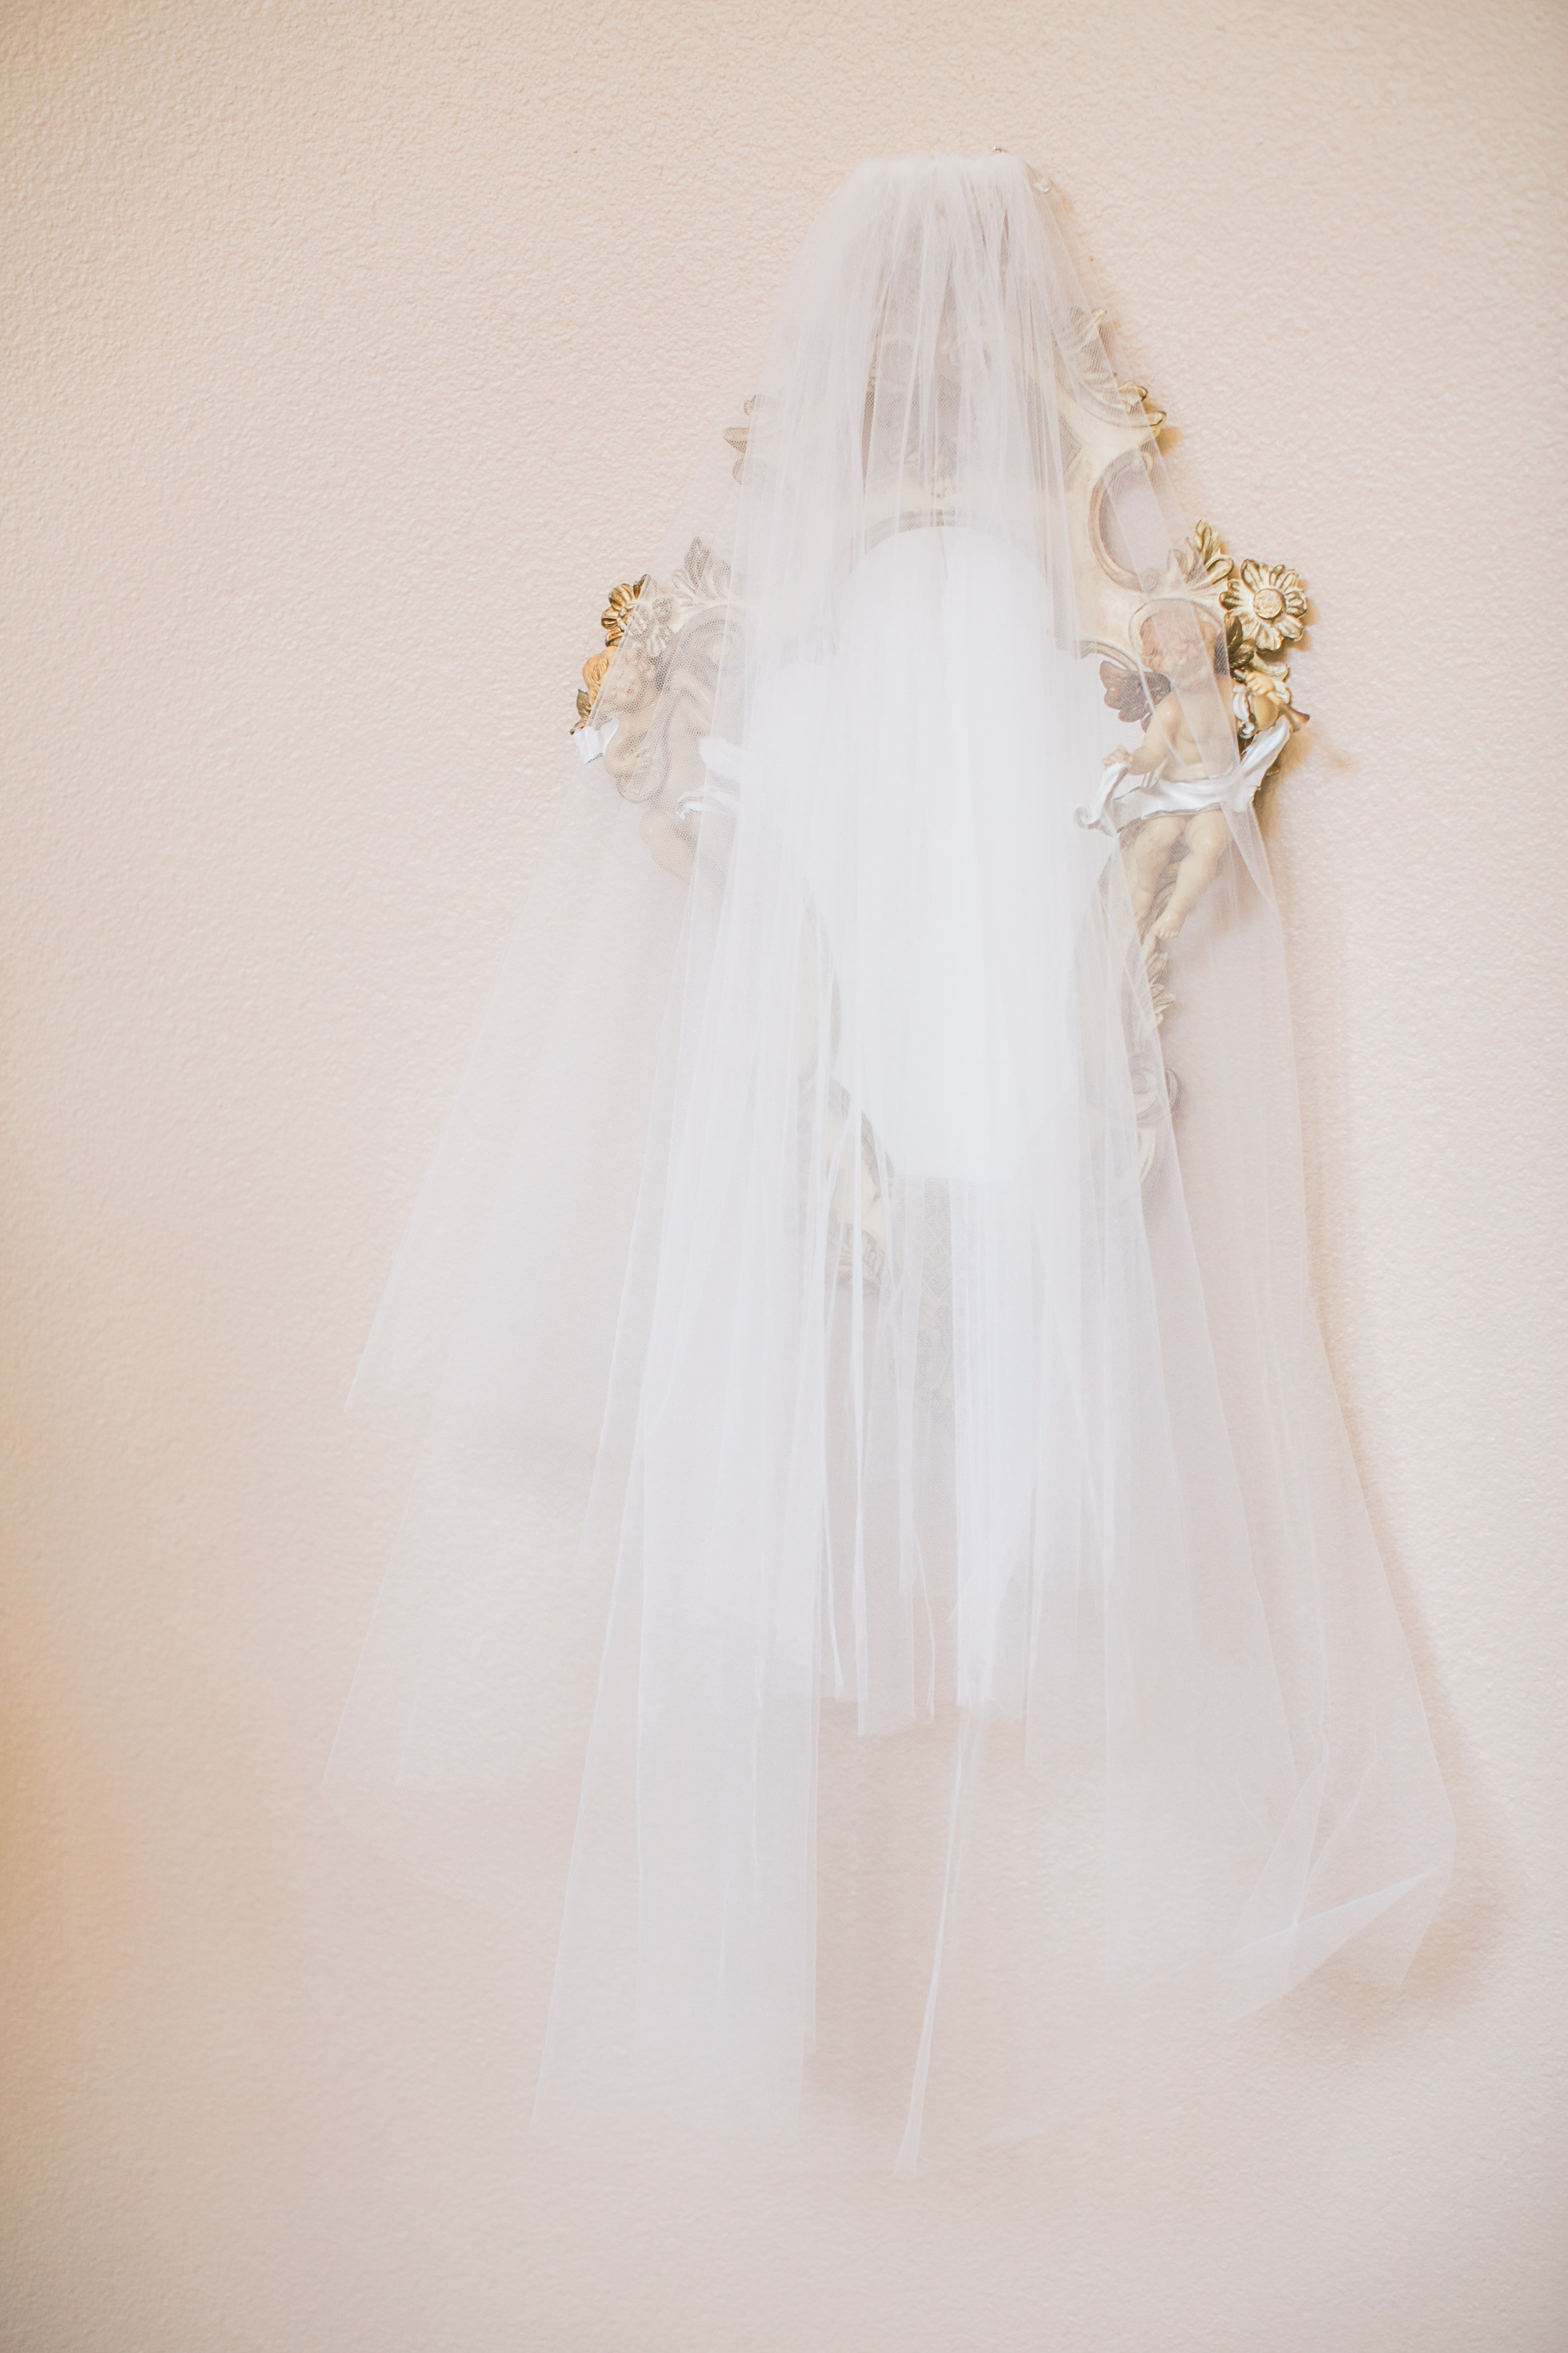 thisgirlnicole_jenny+sean_wedding-17.jpg